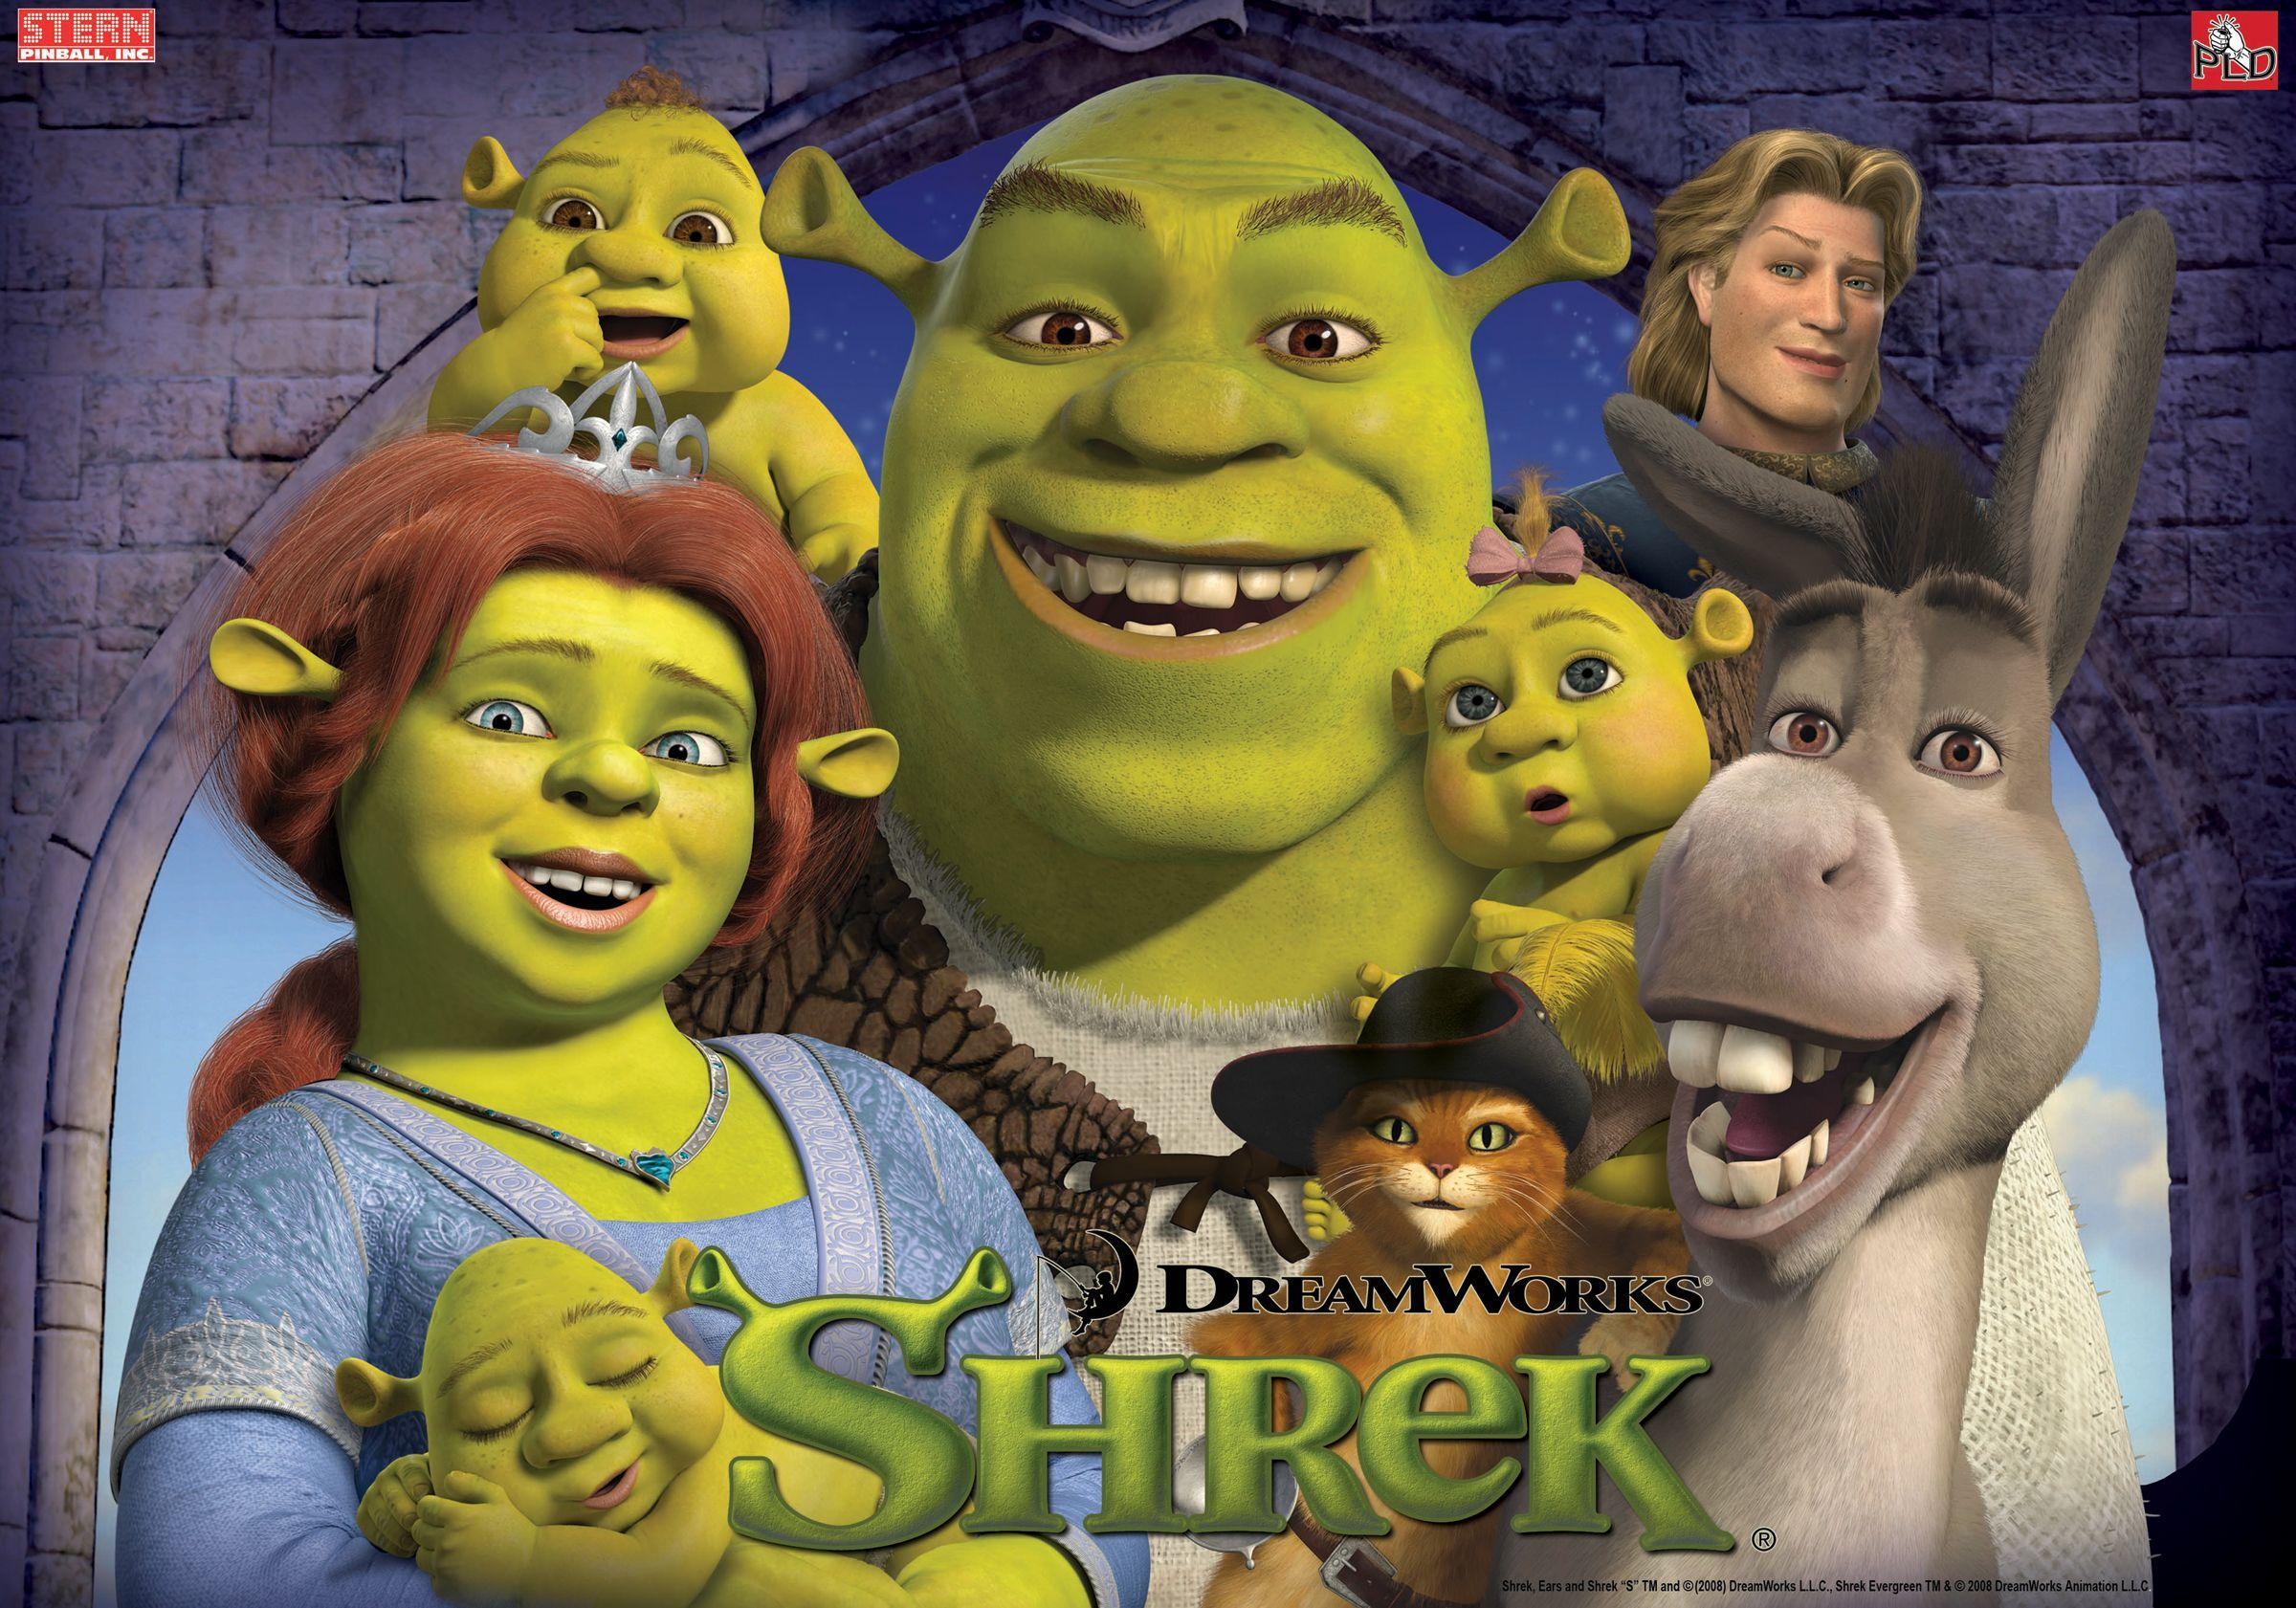 Shrek Cartoon Part 1 Bing Images New Comedy Movies Shrek Animated Movies